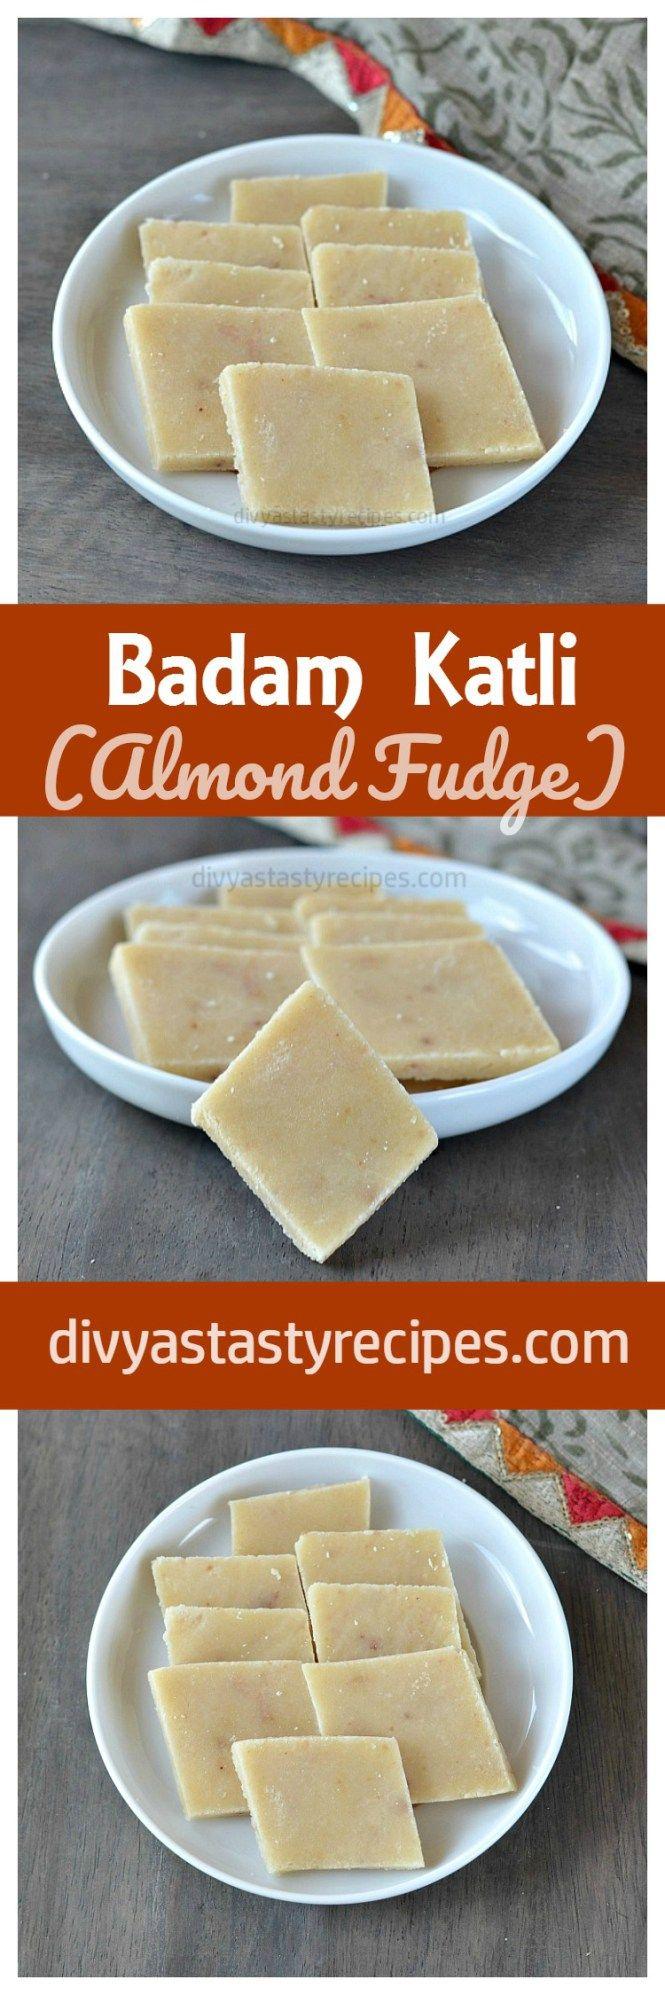 badam katli, vegan almond fudge